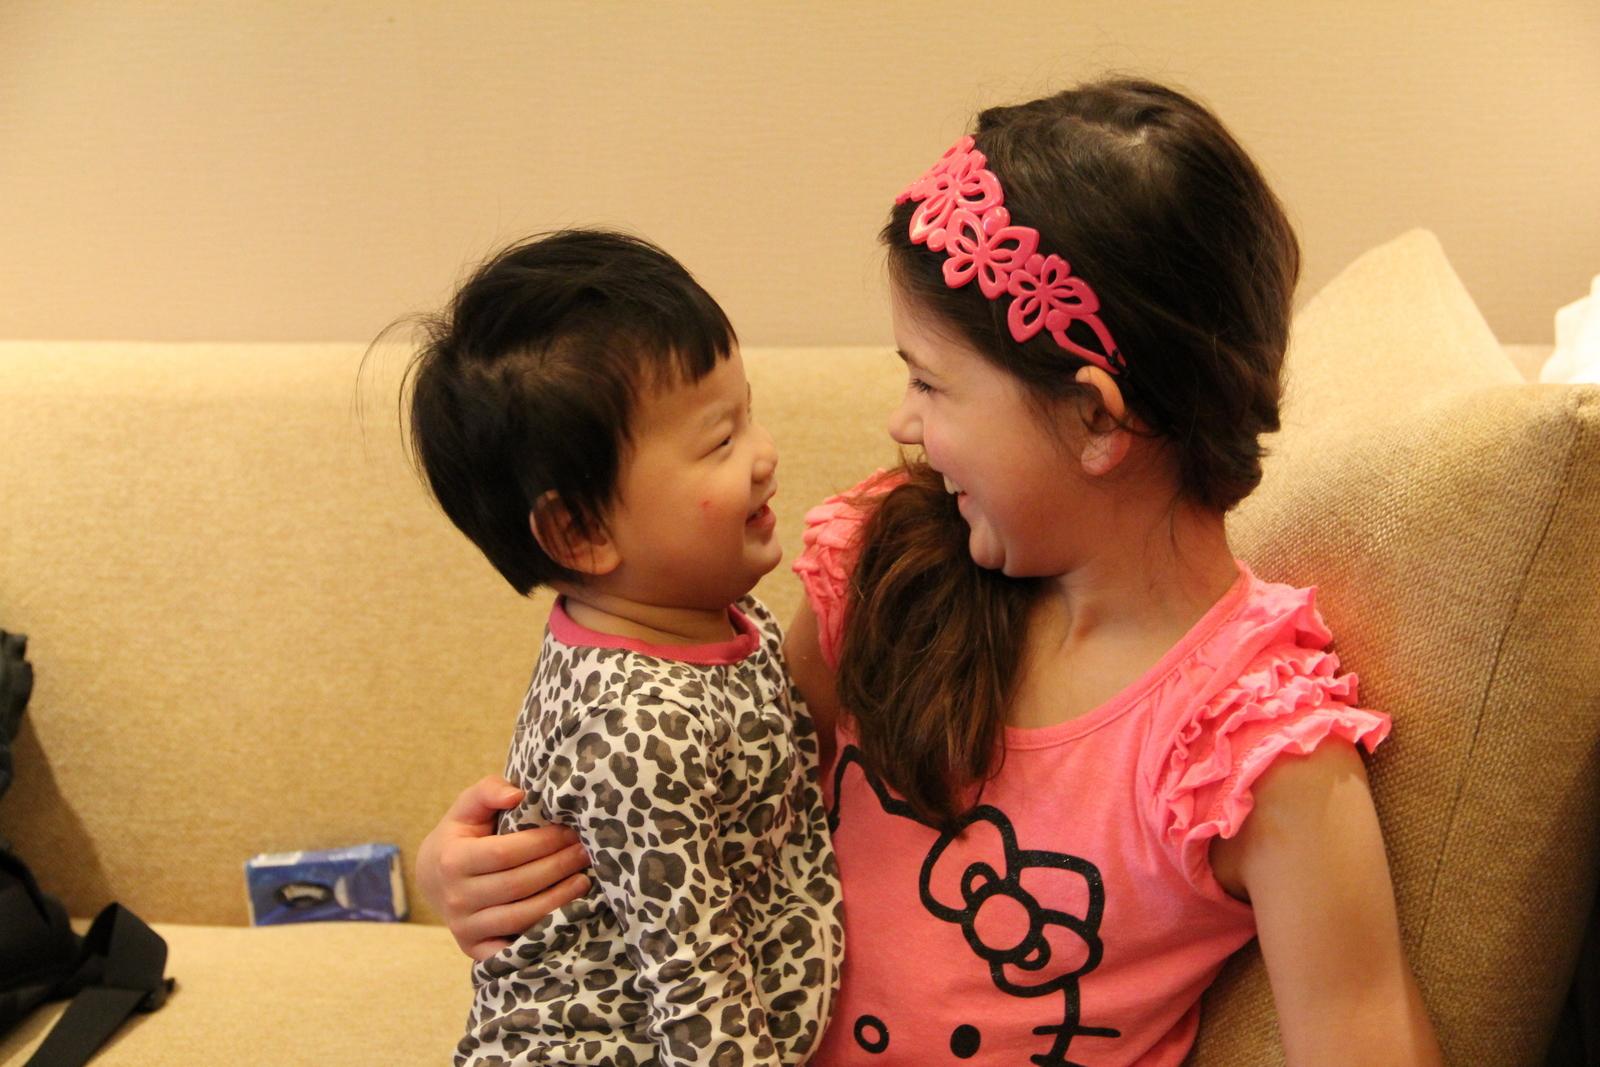 Mei Mei and Jie Jie. (Little Sister and Big Sister)